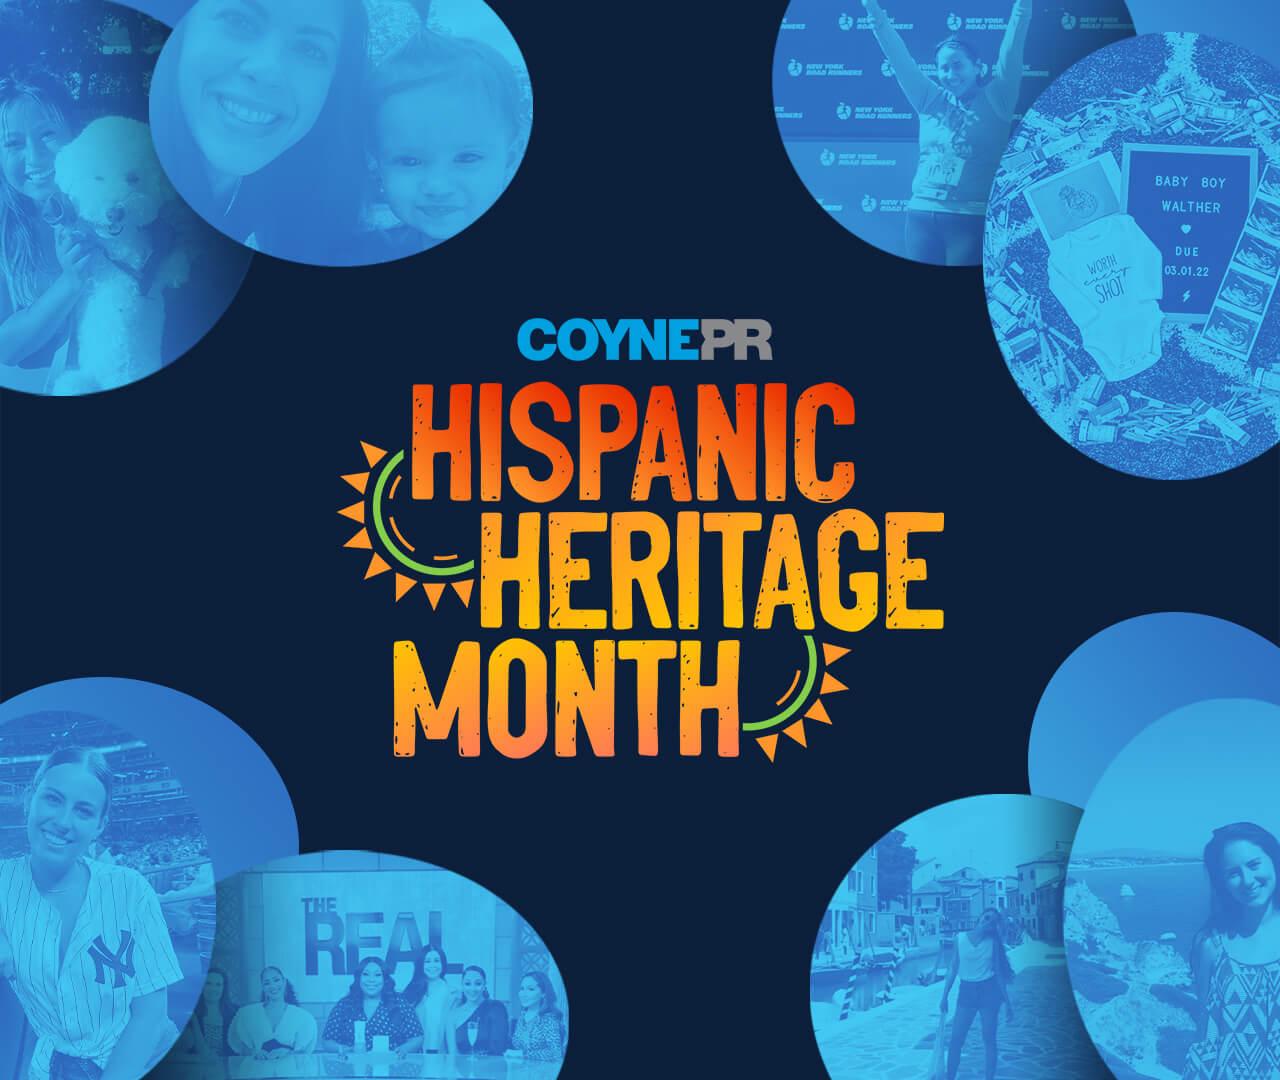 Coyne PR Celebrates Hispanic Heritage Month